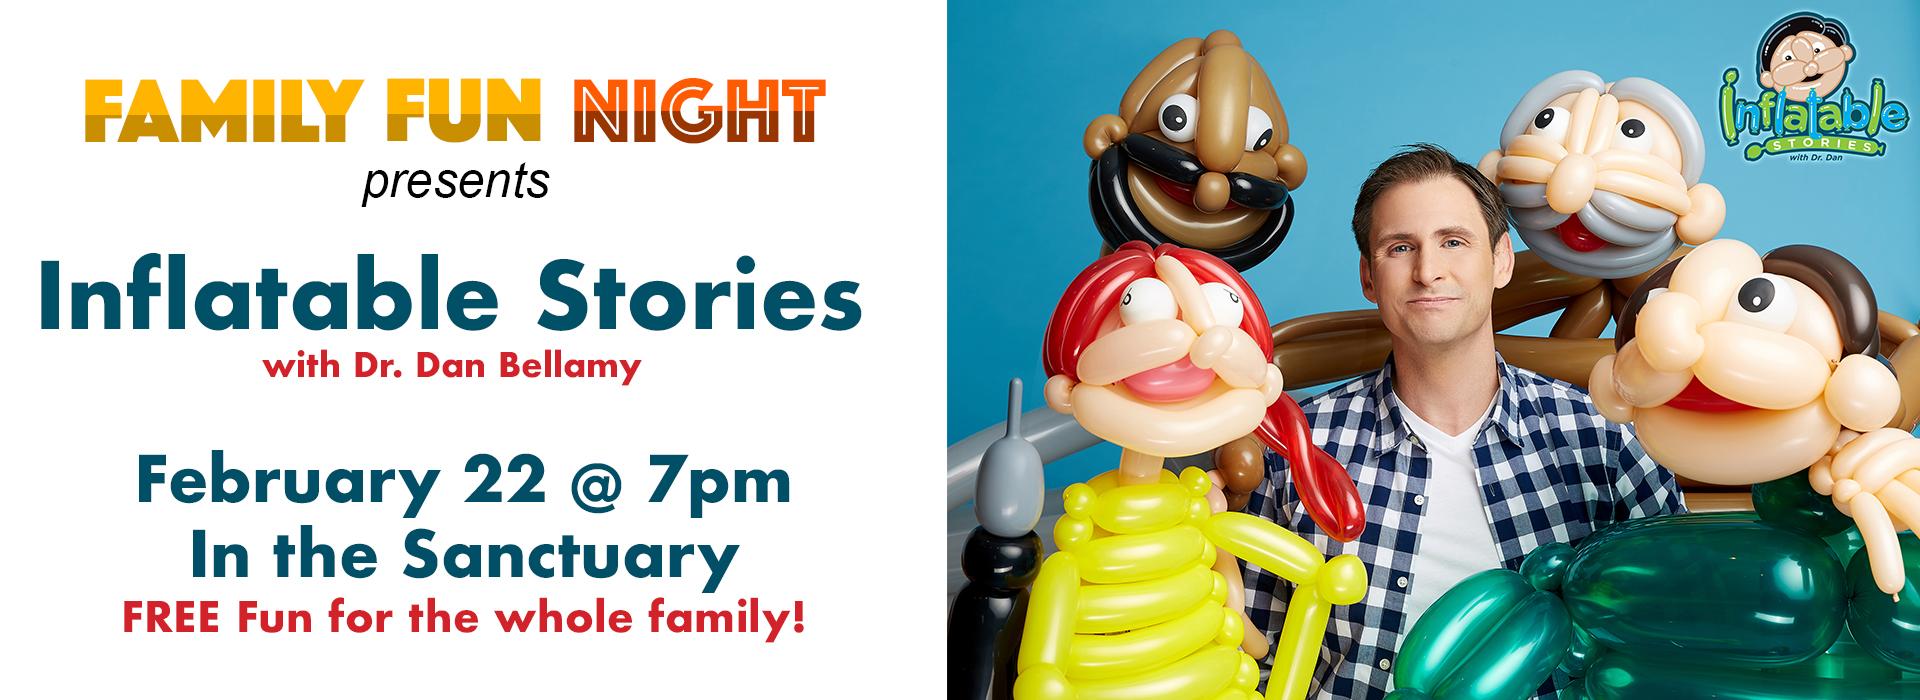 FamilyFunNight_InflatableStories_Feb22.jpg